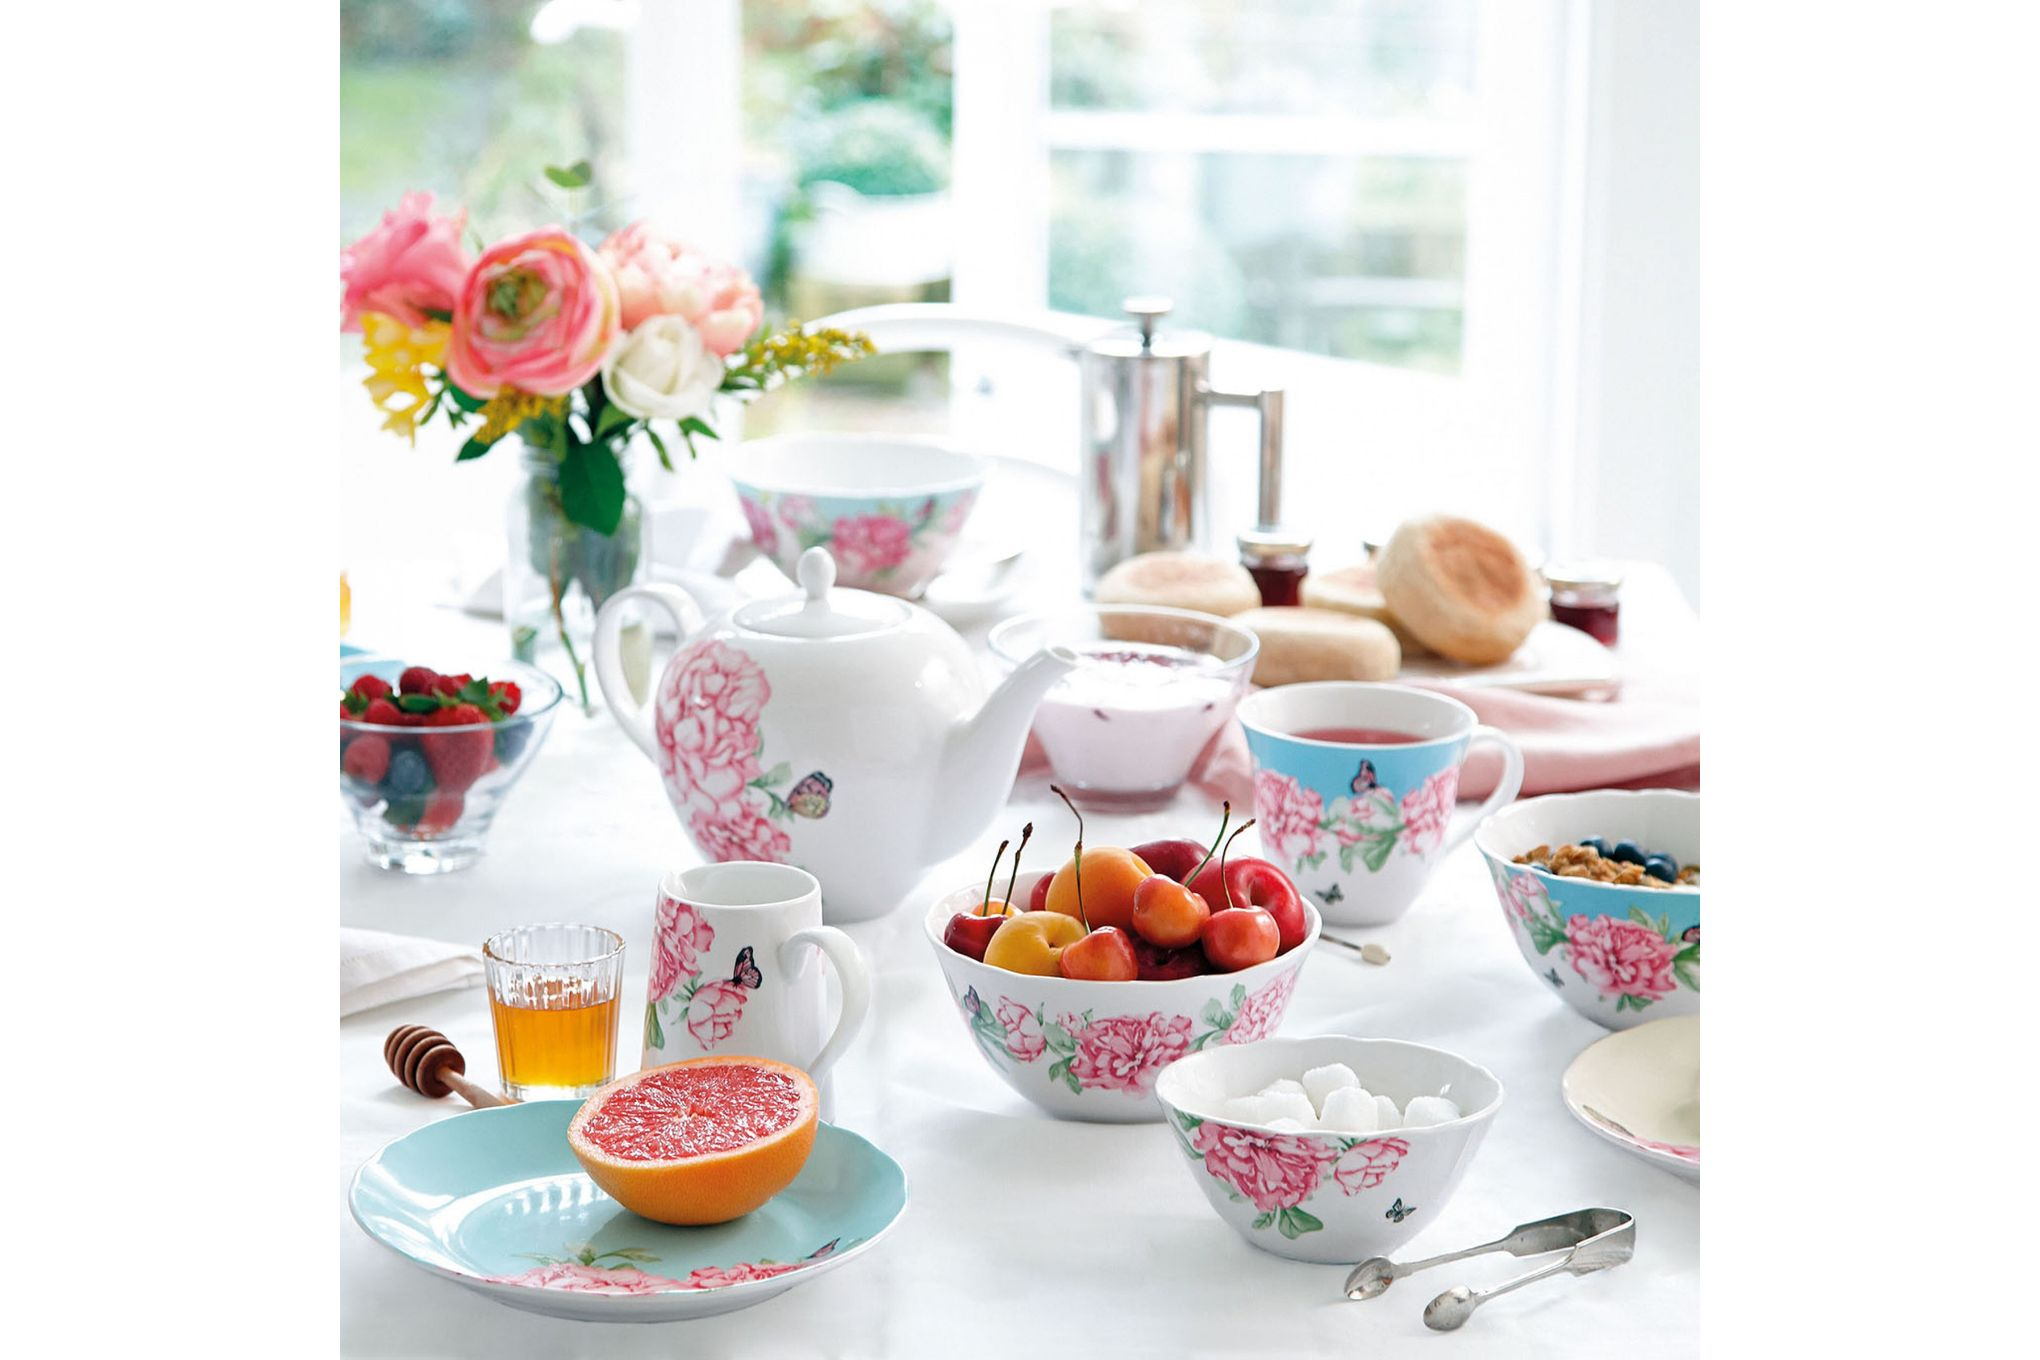 Miranda Kerr for Royal Albert Everyday Friendship Teacup & Saucer Green thumb 2